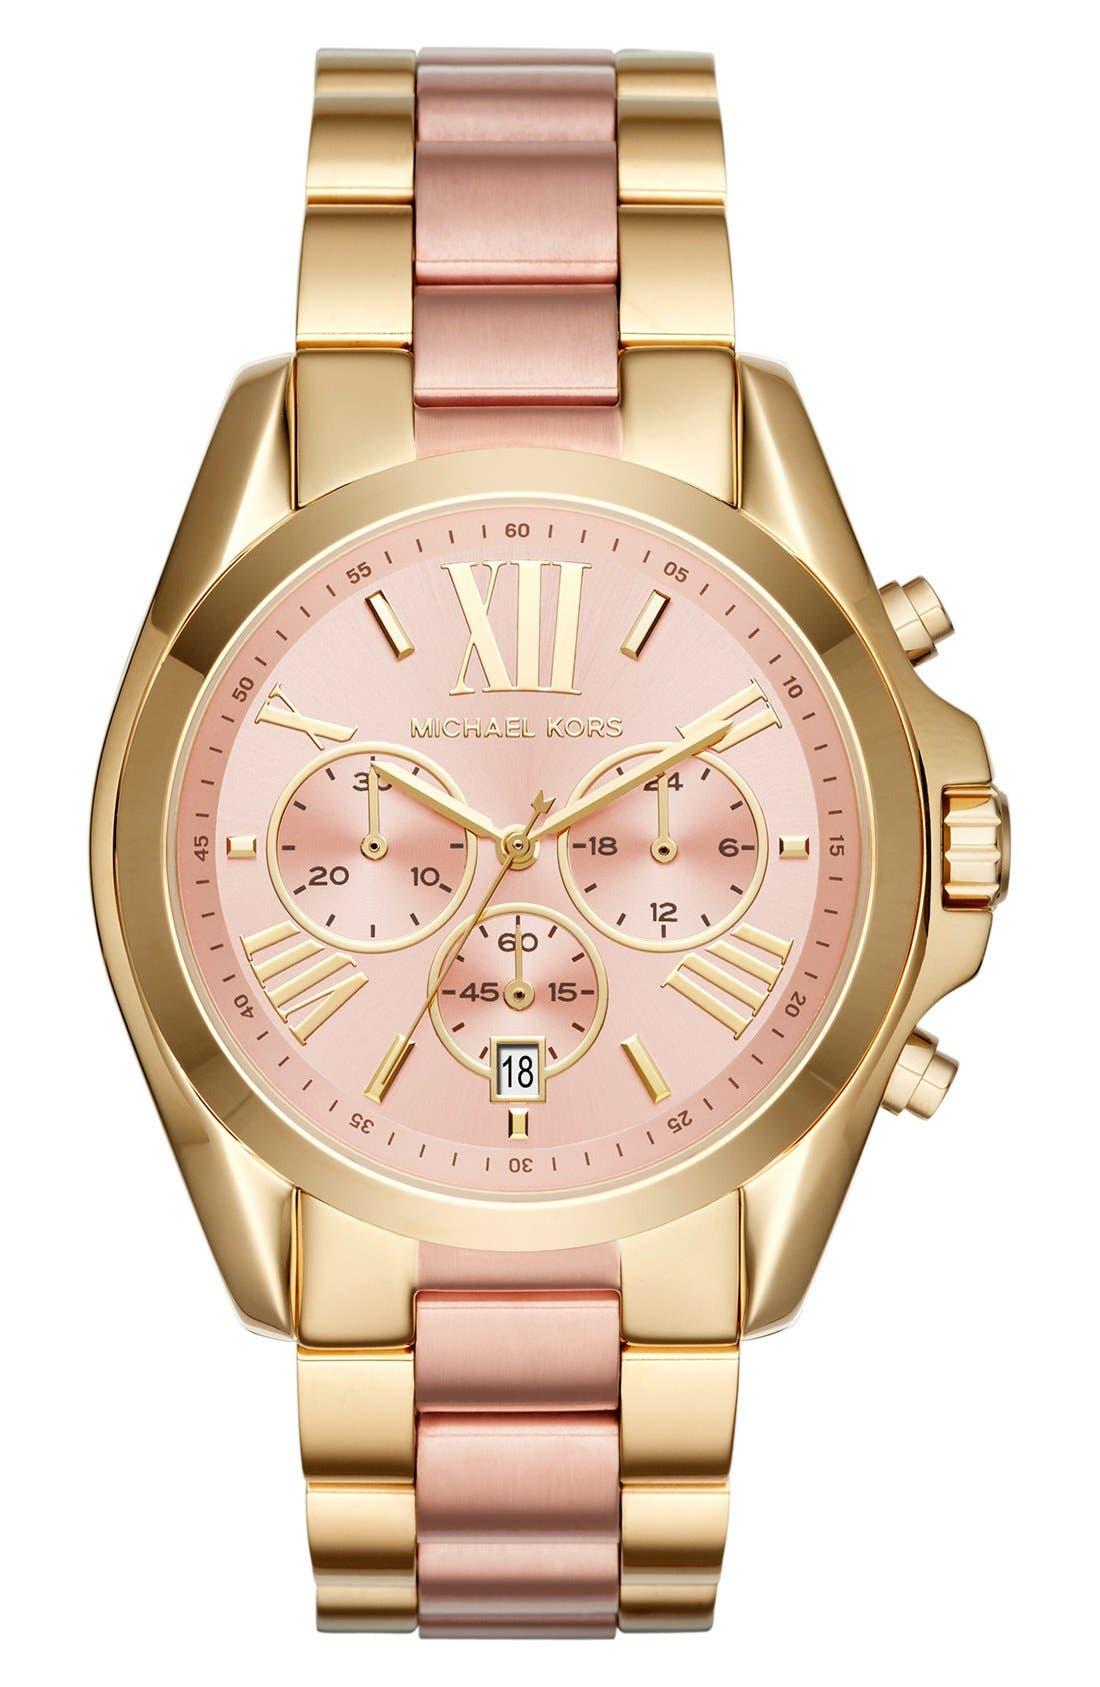 Main Image - Michael Kors Bradshaw Chronograph Bracelet Watch, 43mm